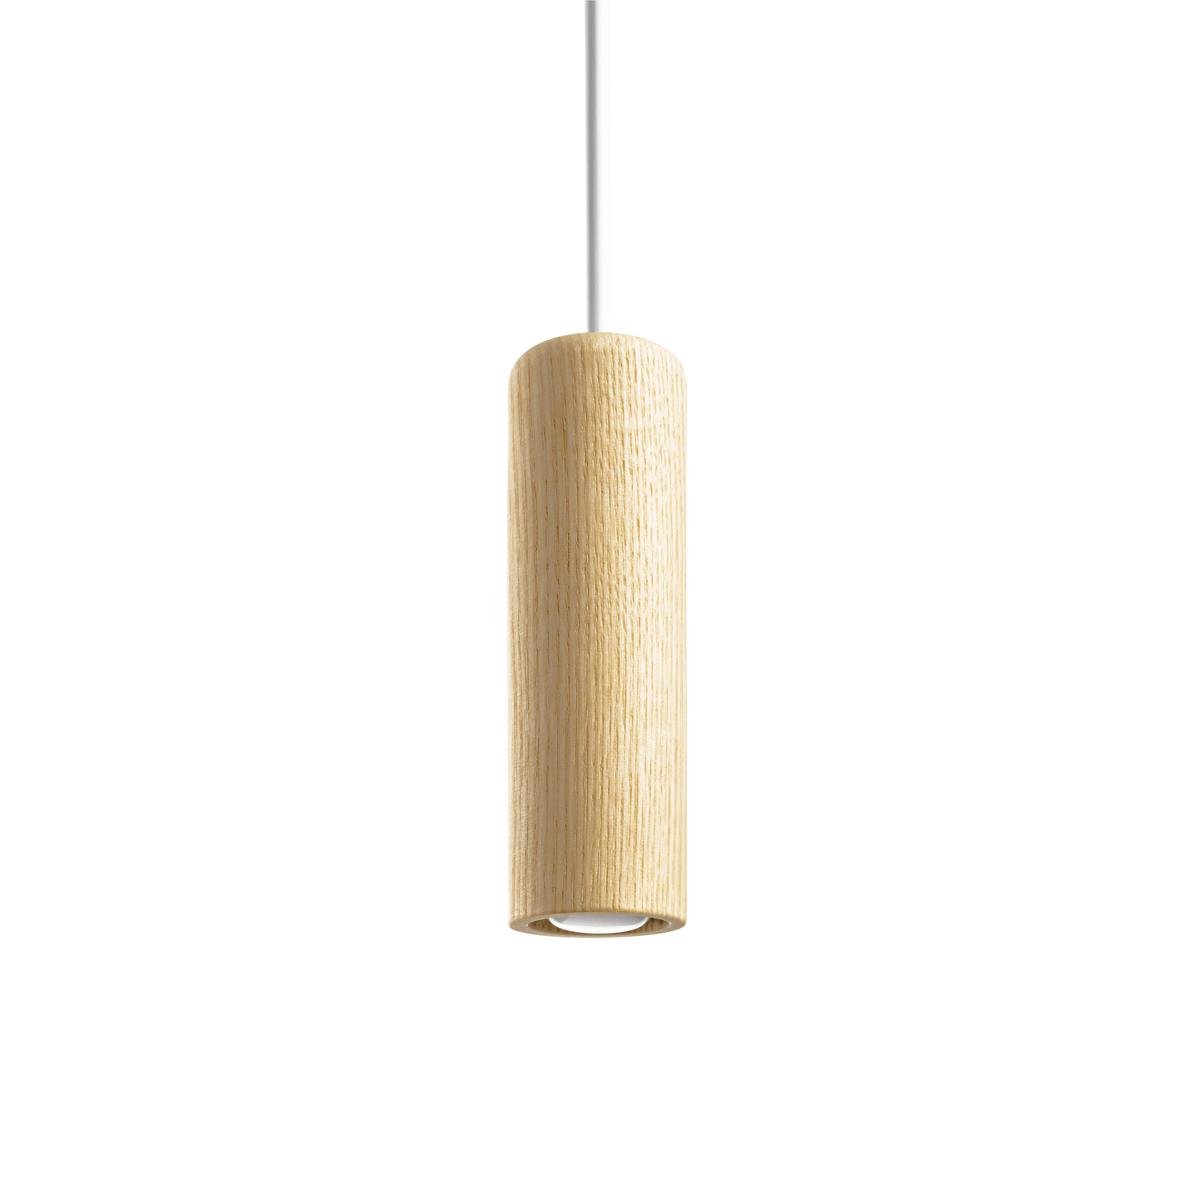 Mini Hanglamp Transparant Hout Minimalisme Gimmii